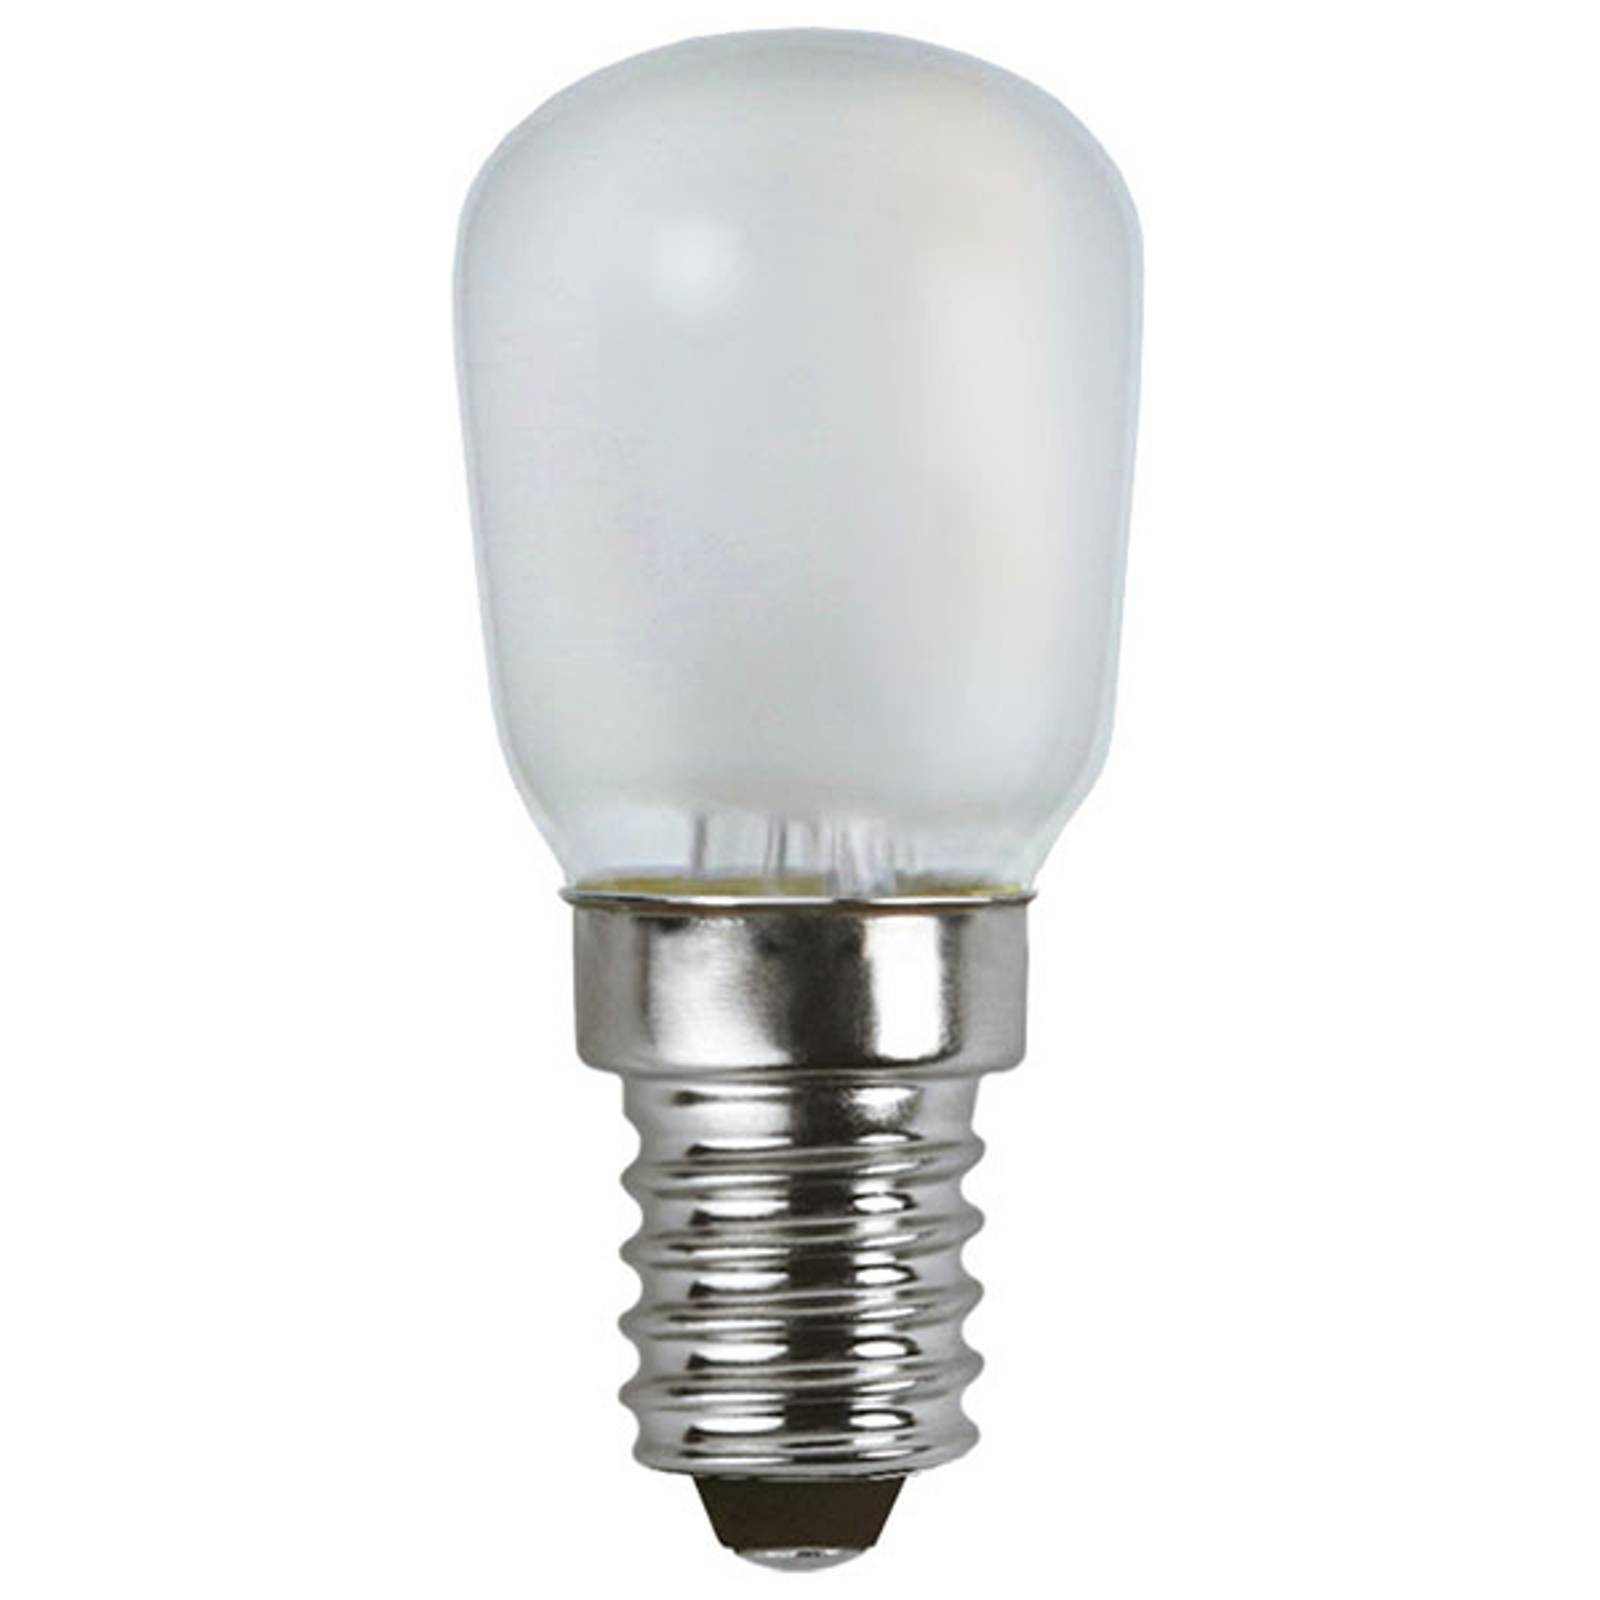 LED-lamppu E14 T26 1,3W, lämmin valkoinen, frosted